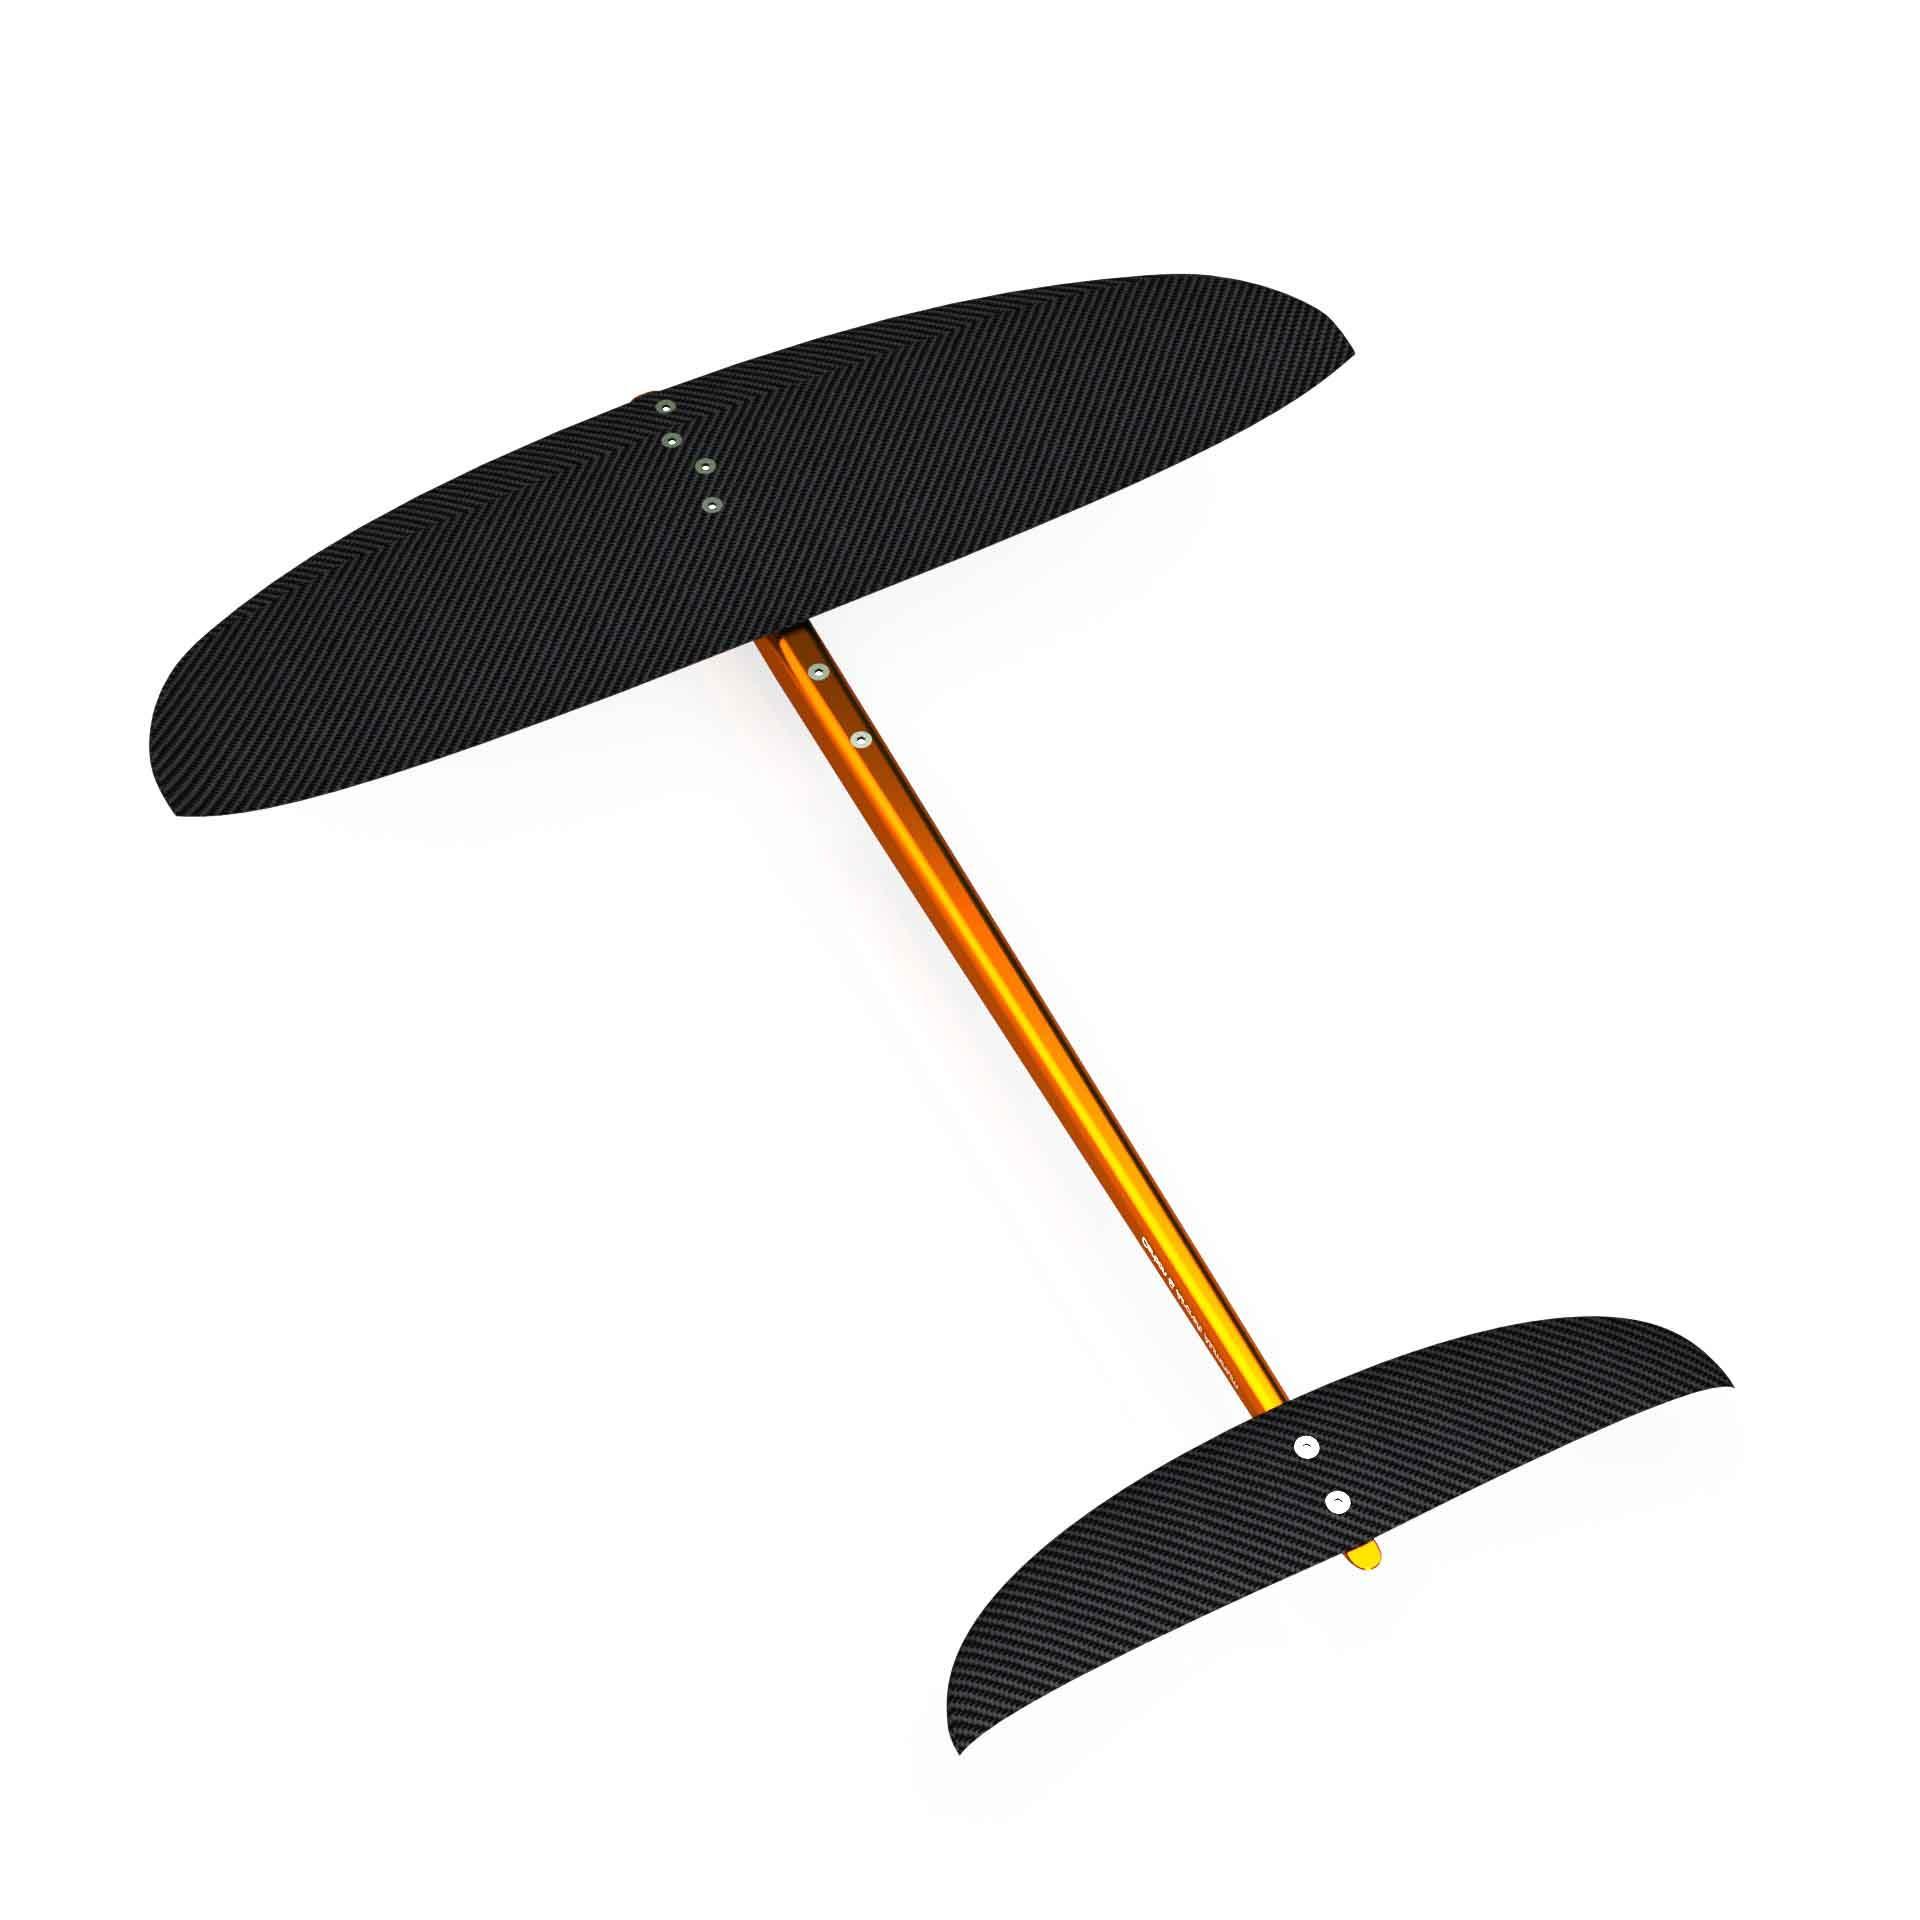 Kitefoil alpinefoil ezee 1000 12